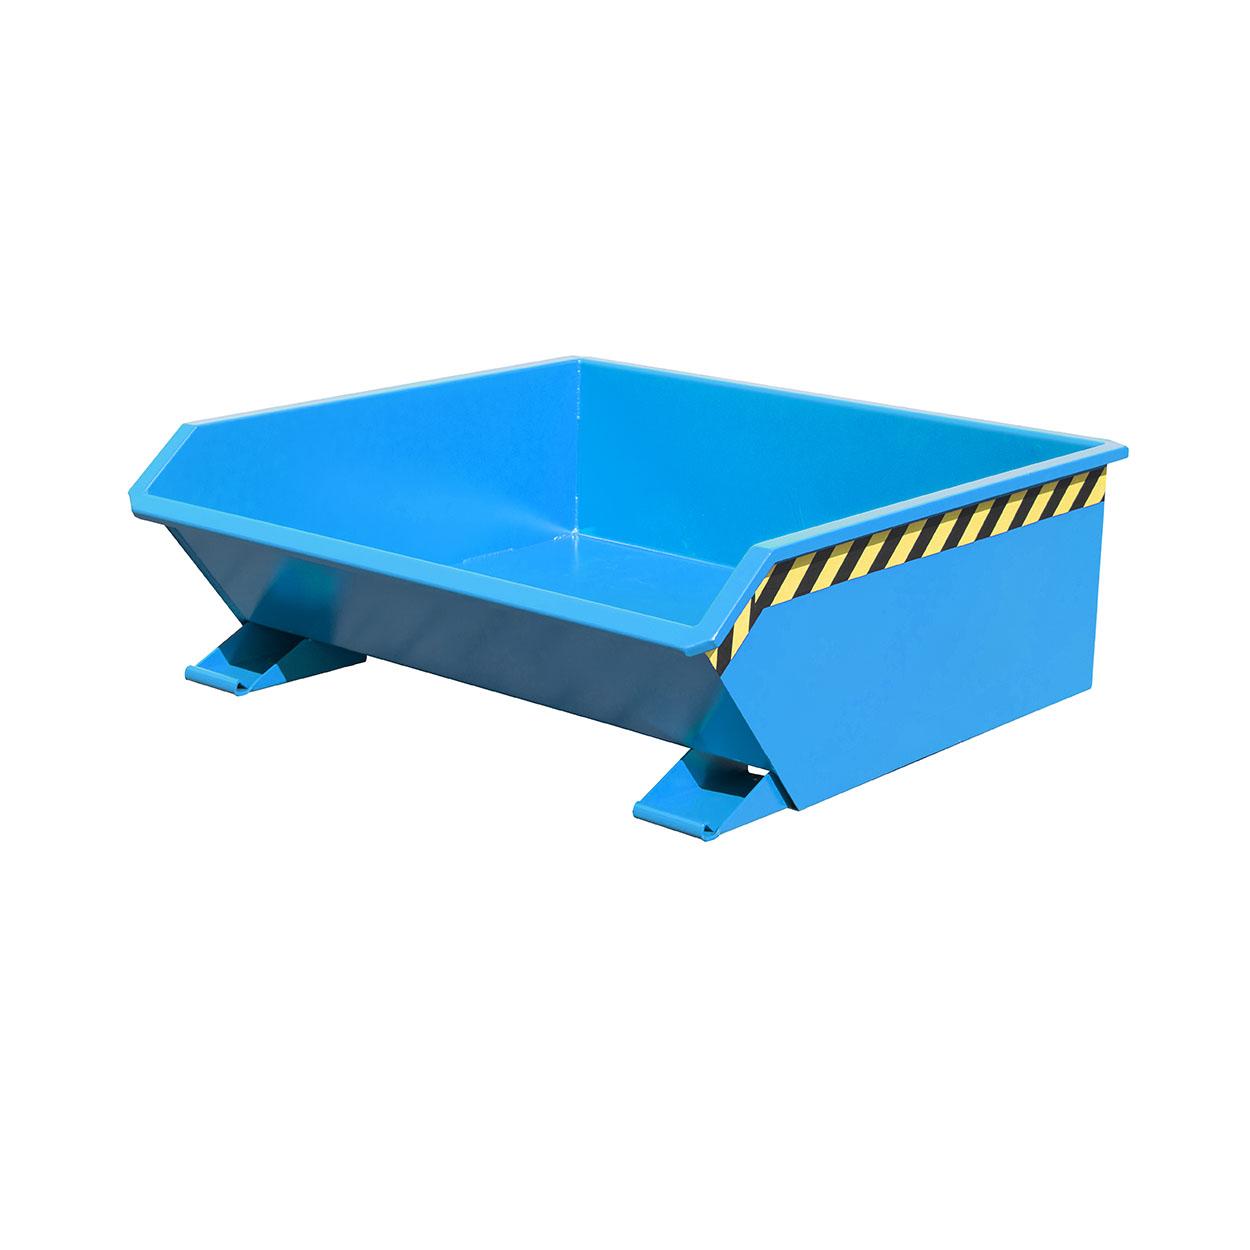 Výklopný kontejner MINI